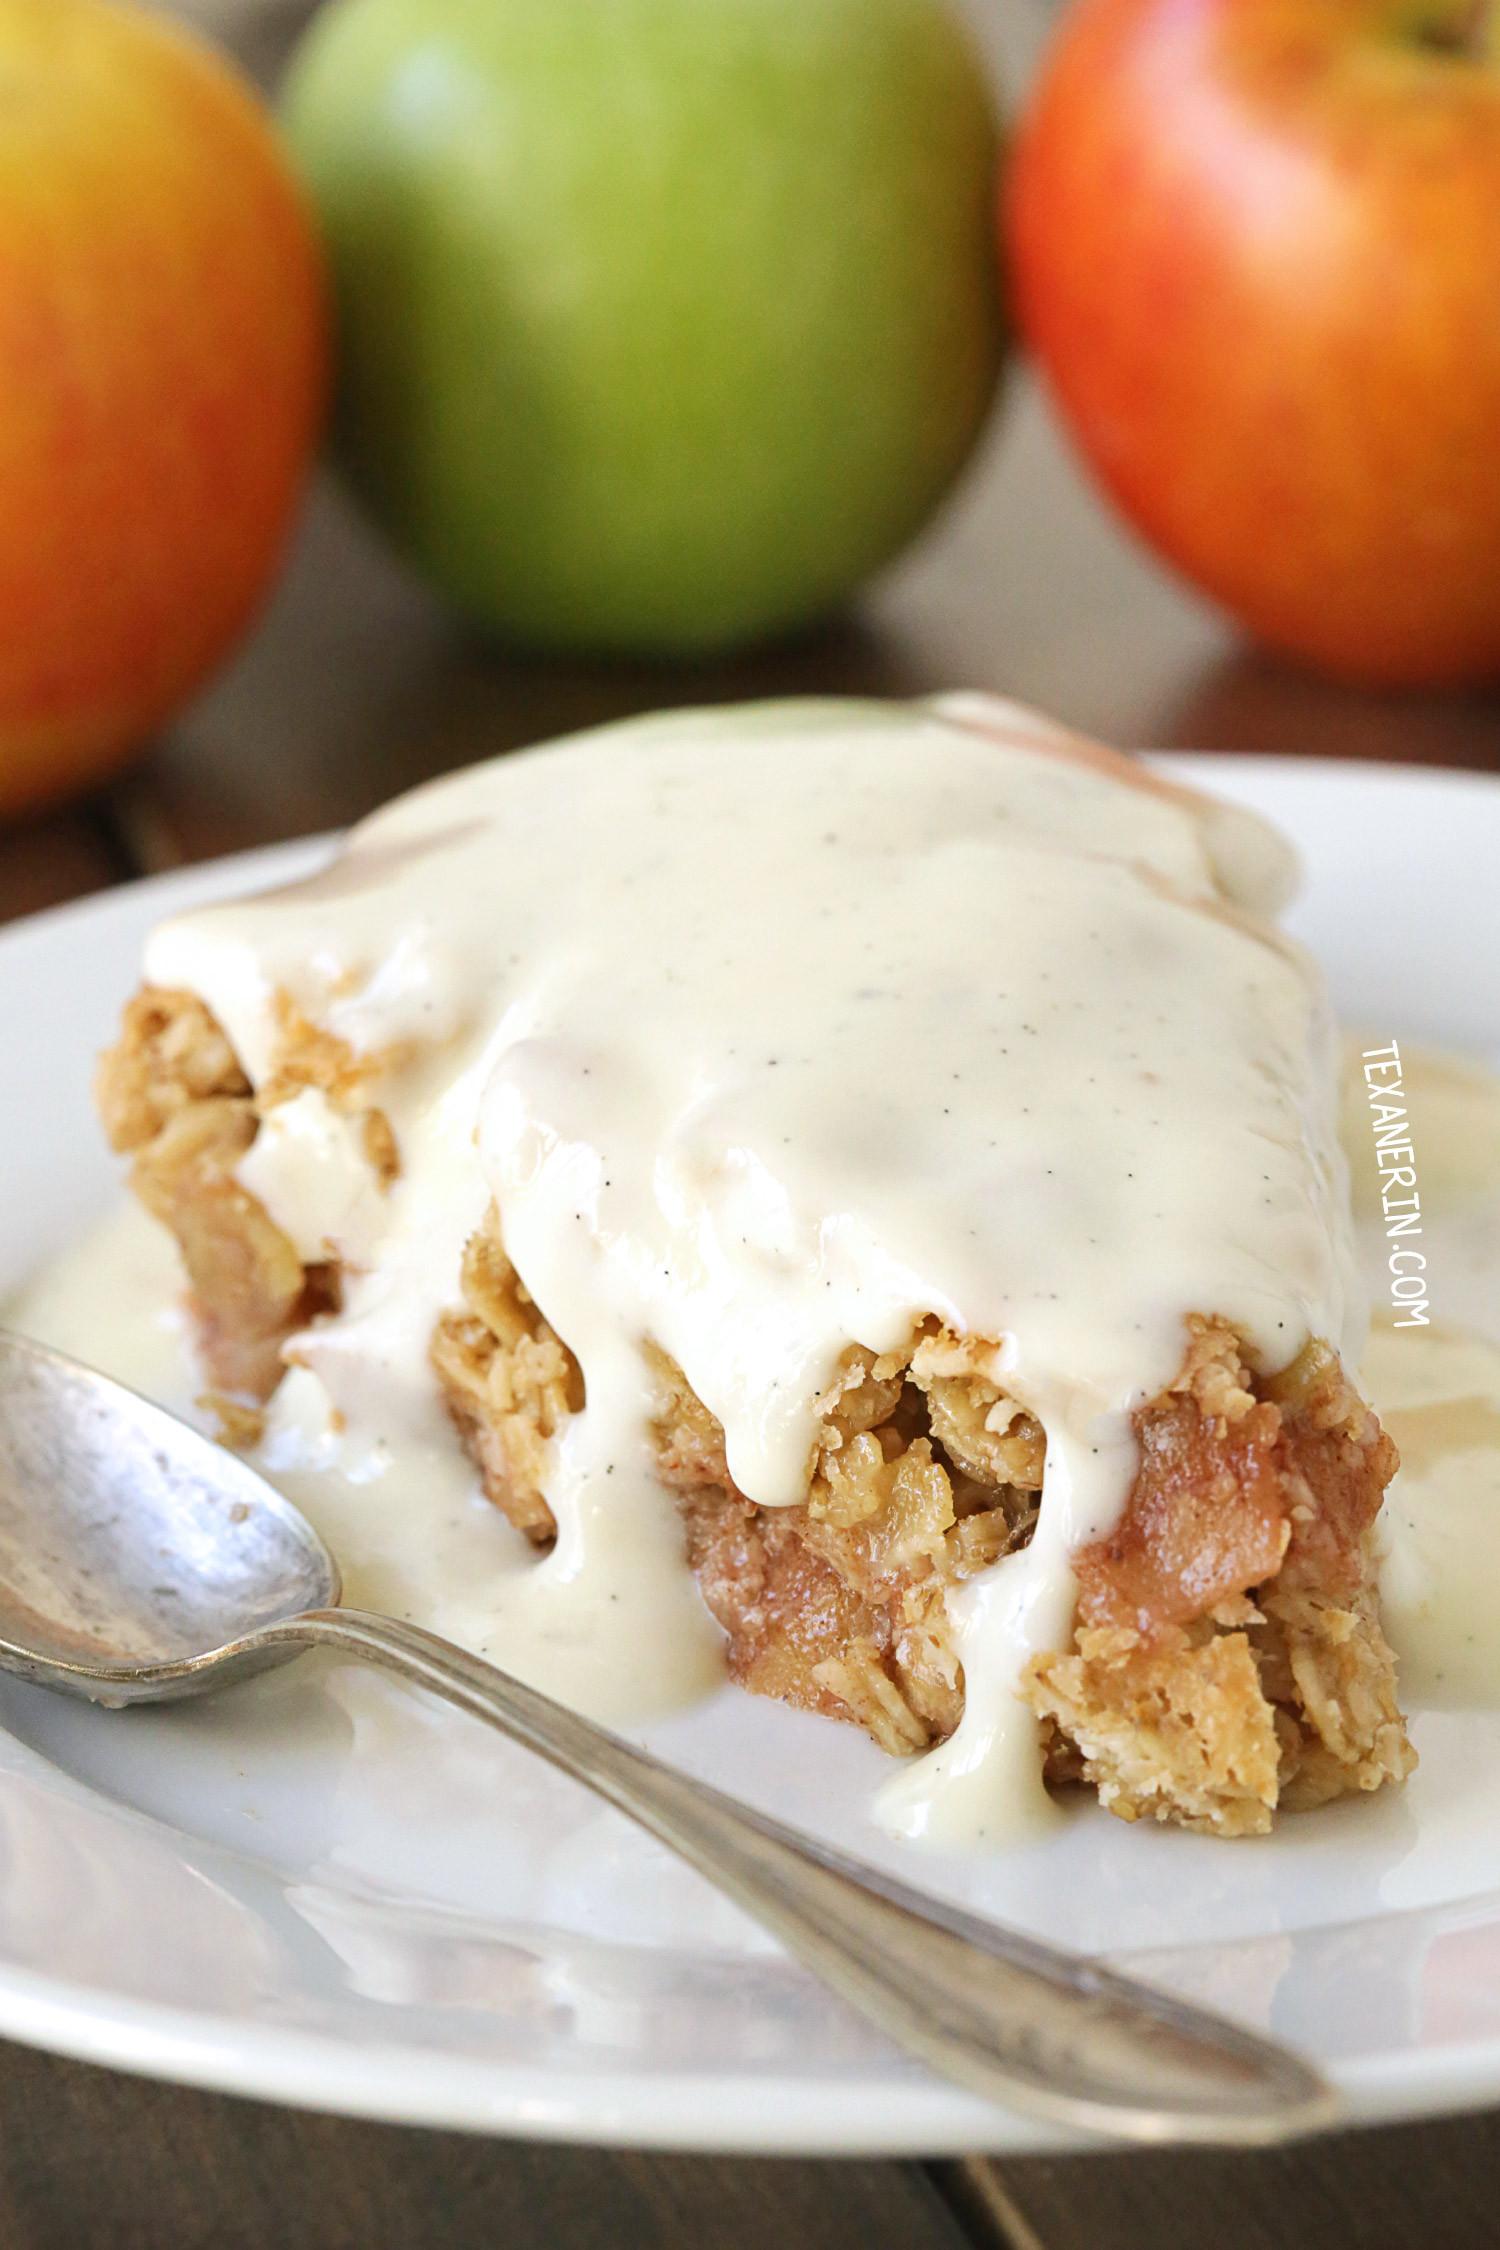 Dairy Free Apple Pie Swedish Apple Pie gluten free vegan whole grain dairy